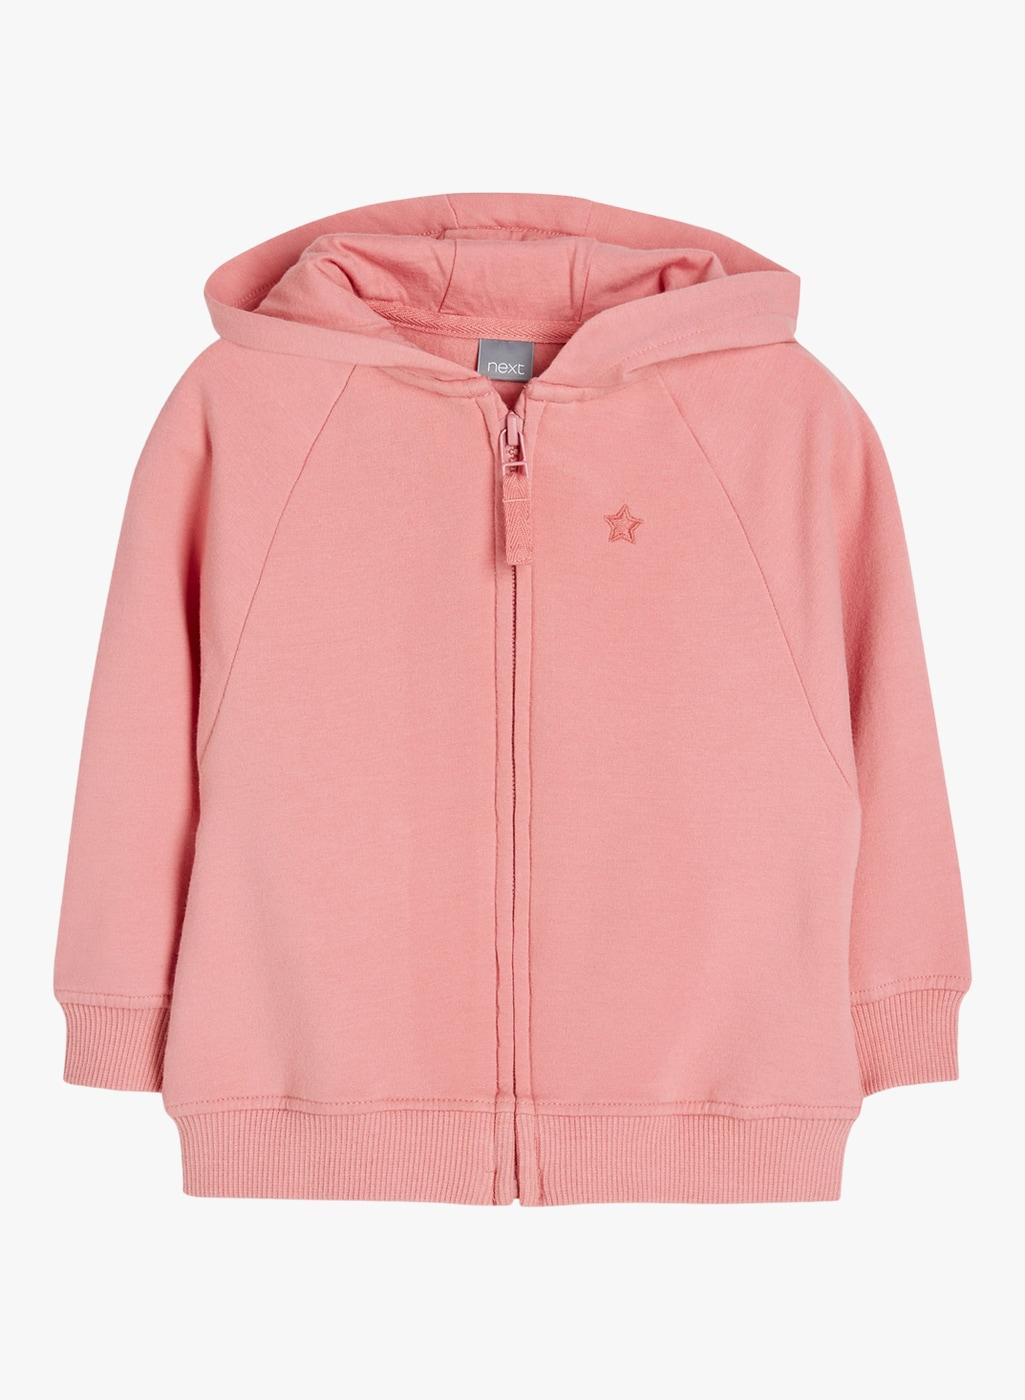 654f36850 Kids Sweatshirts- Buy Sweatshirts for Kids online in India